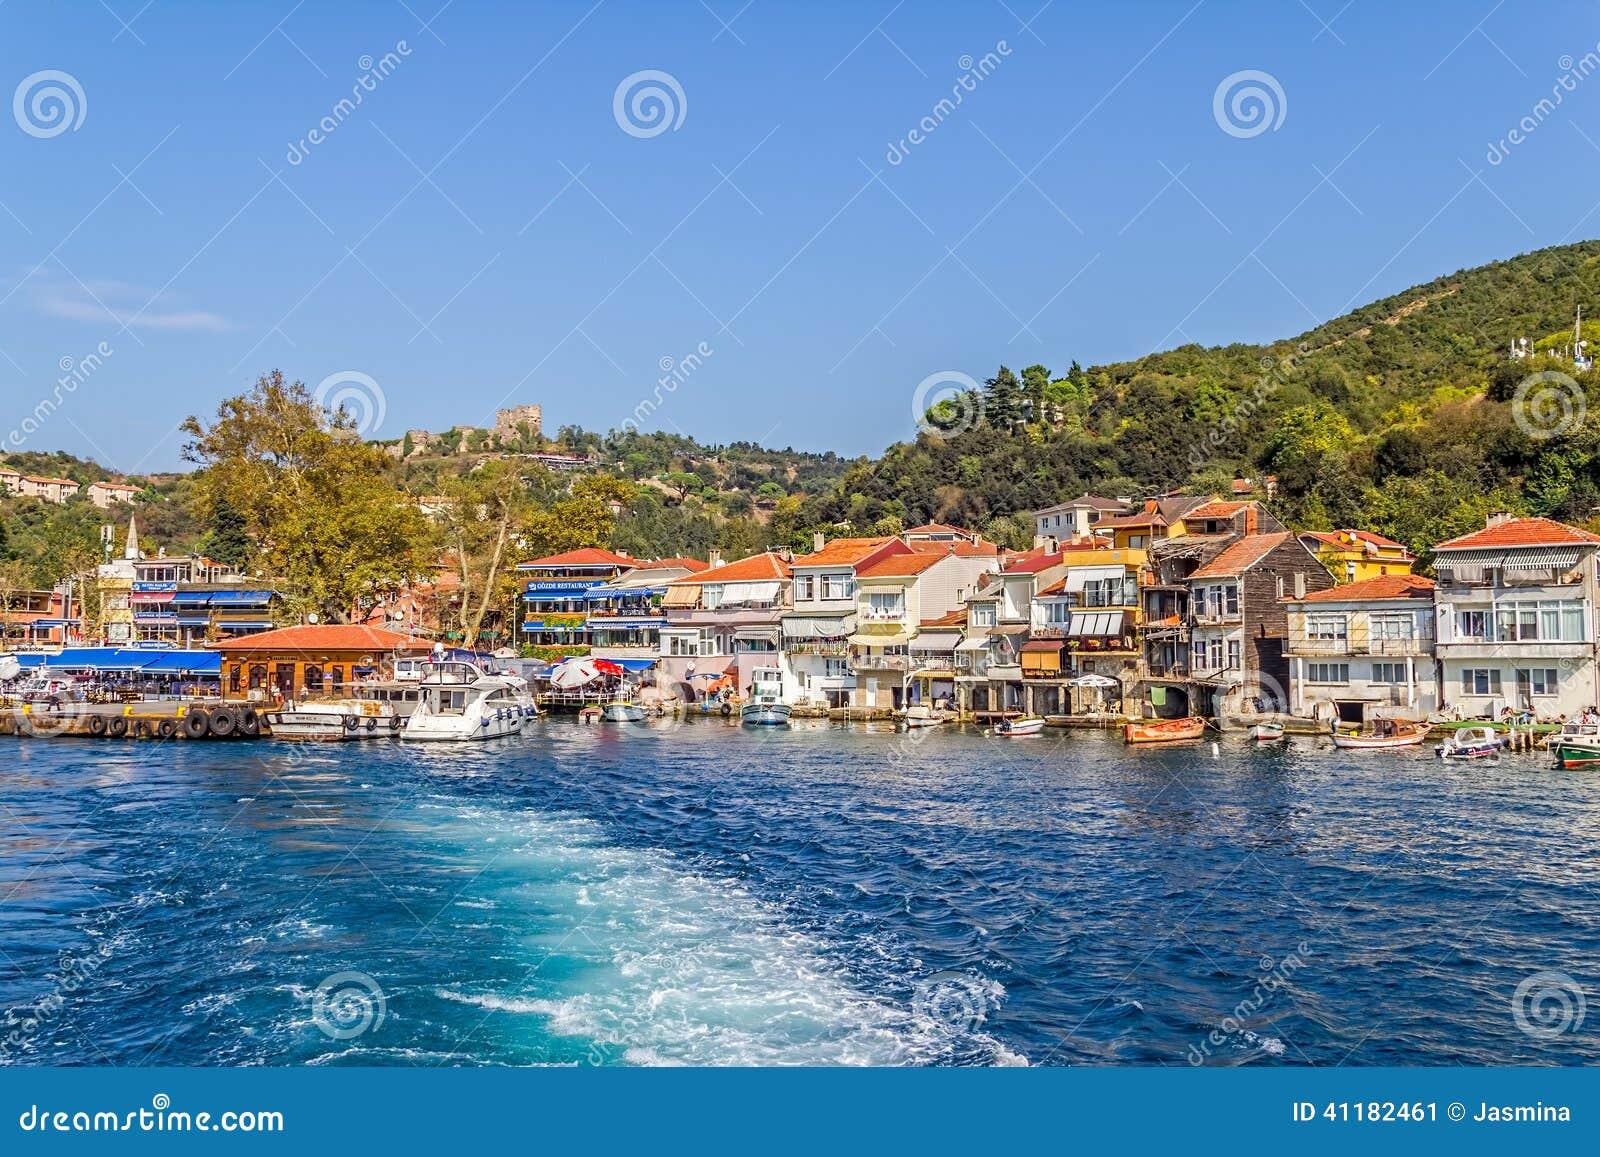 Anadolu Kavagi by